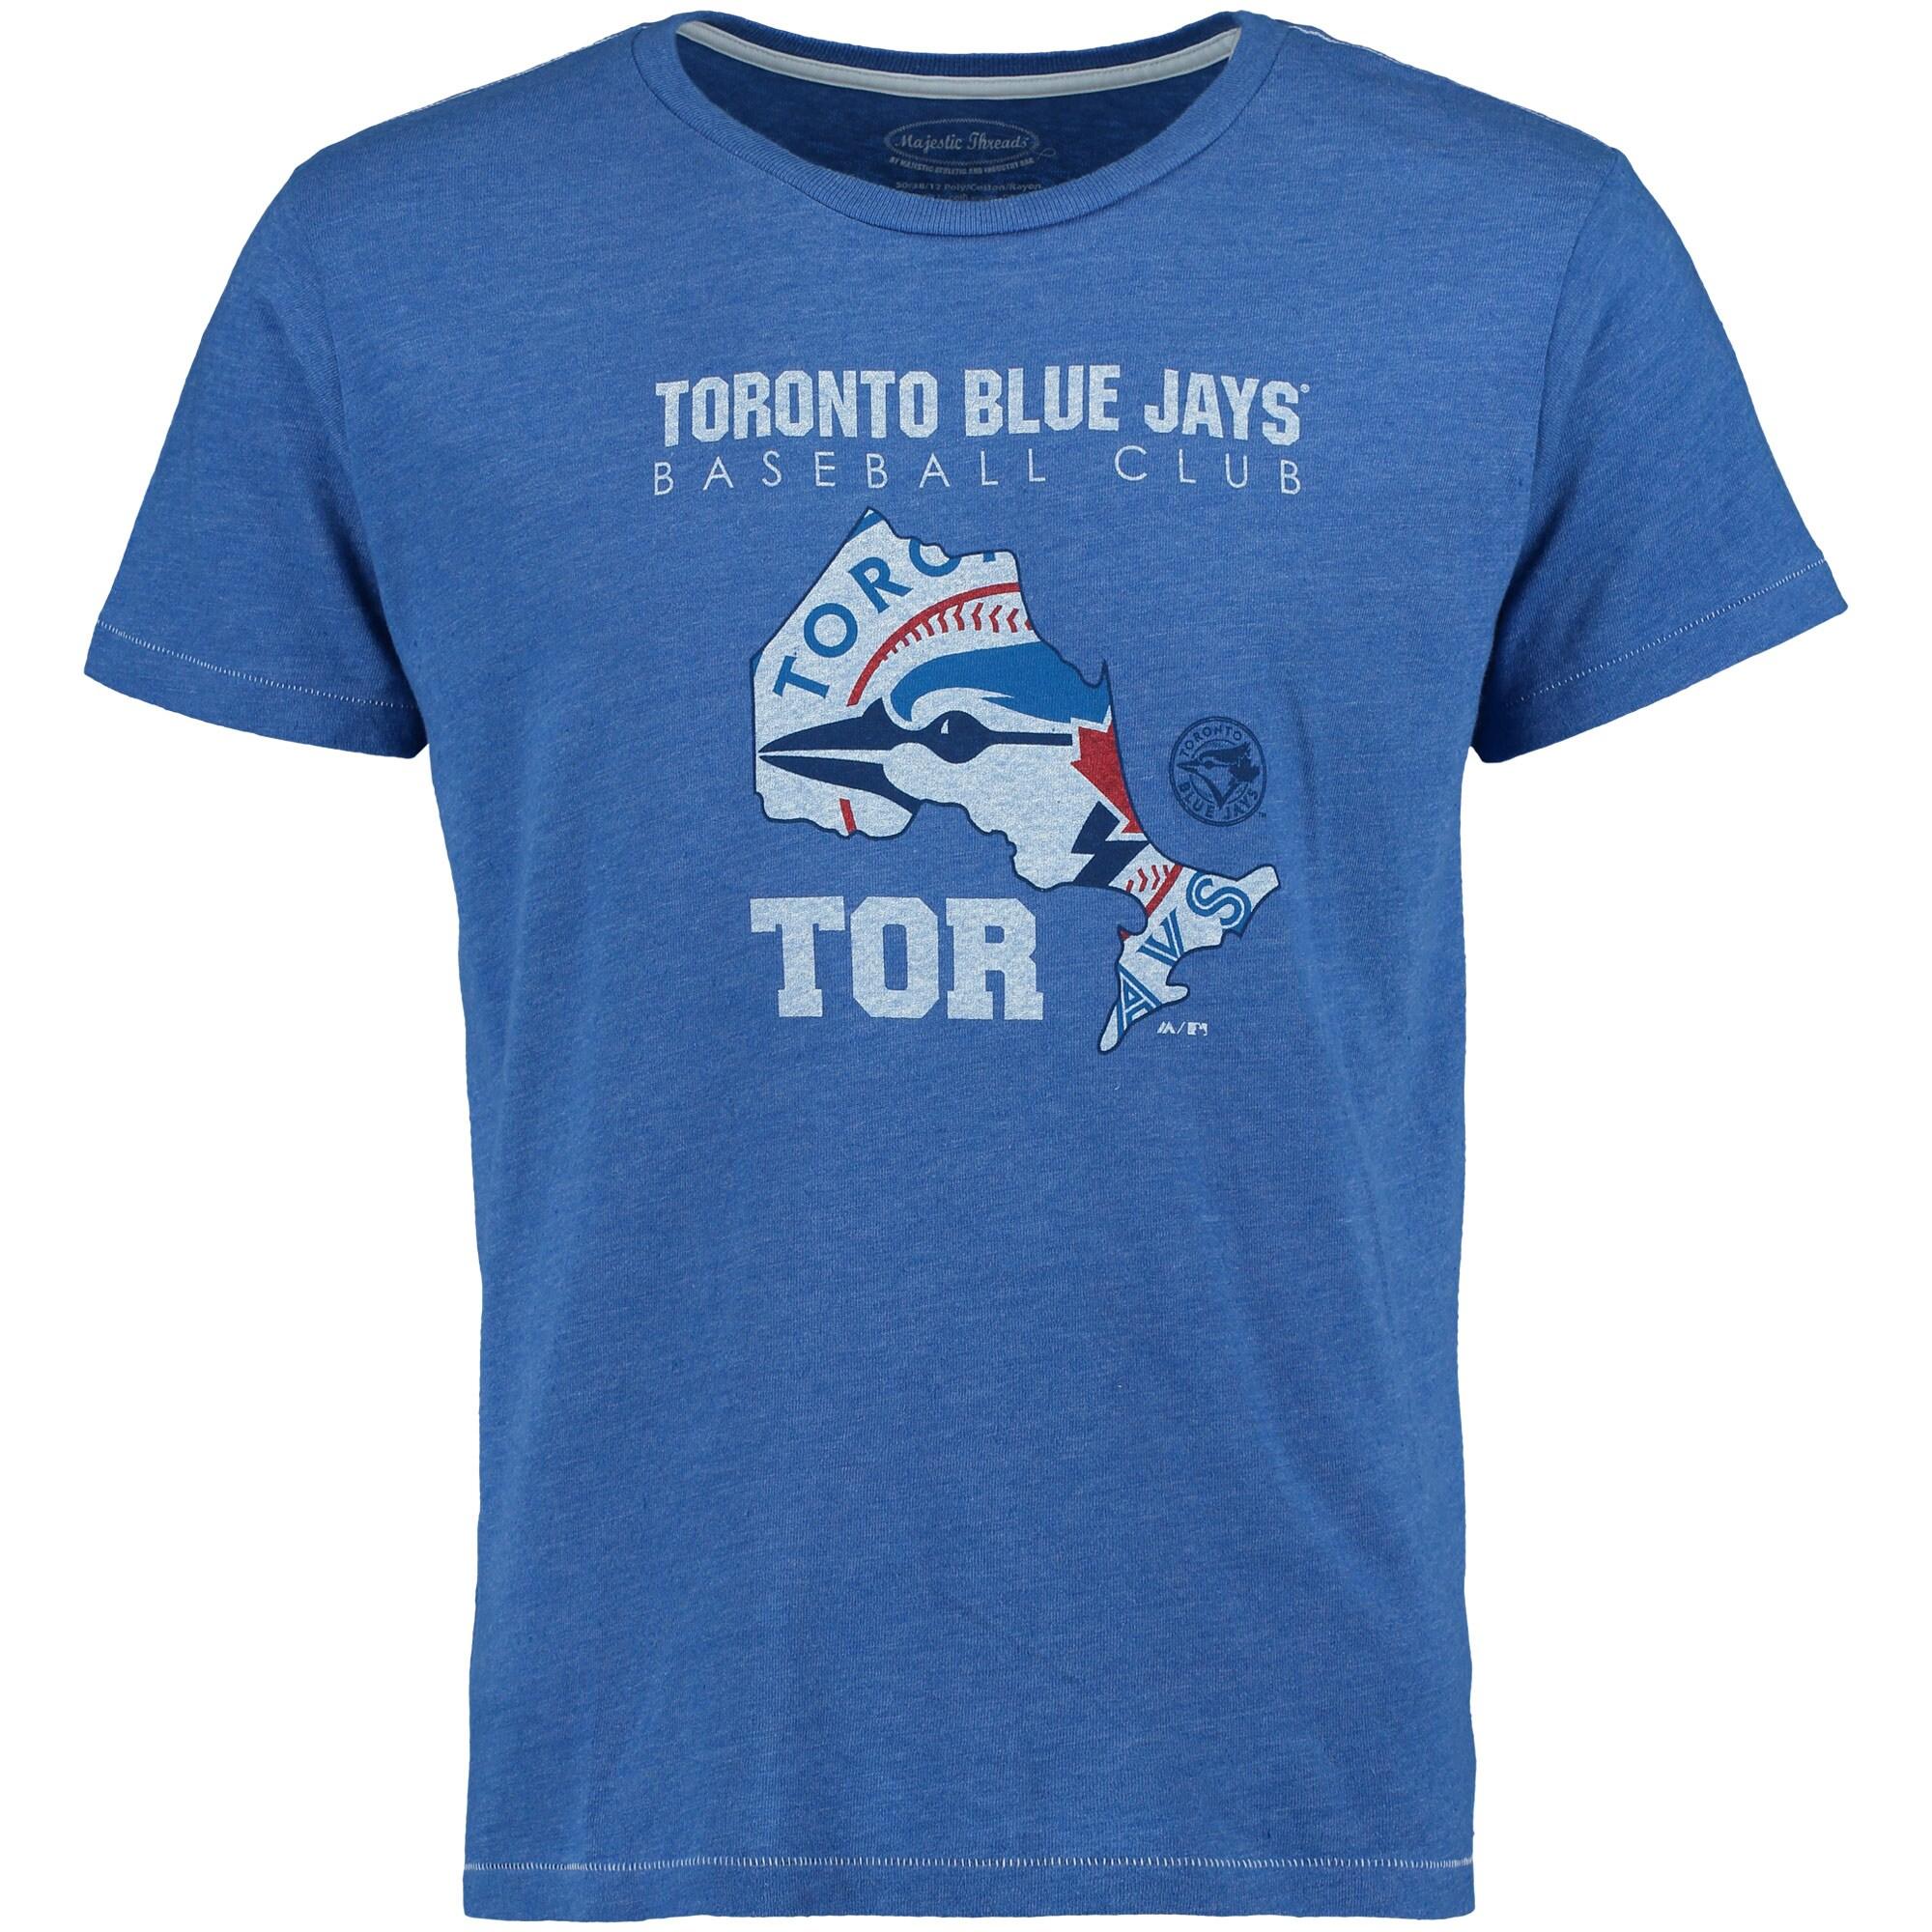 Toronto Blue Jays Majestic Threads State Sport Tri-Blend Contrast Stitch T-Shirt - Royal